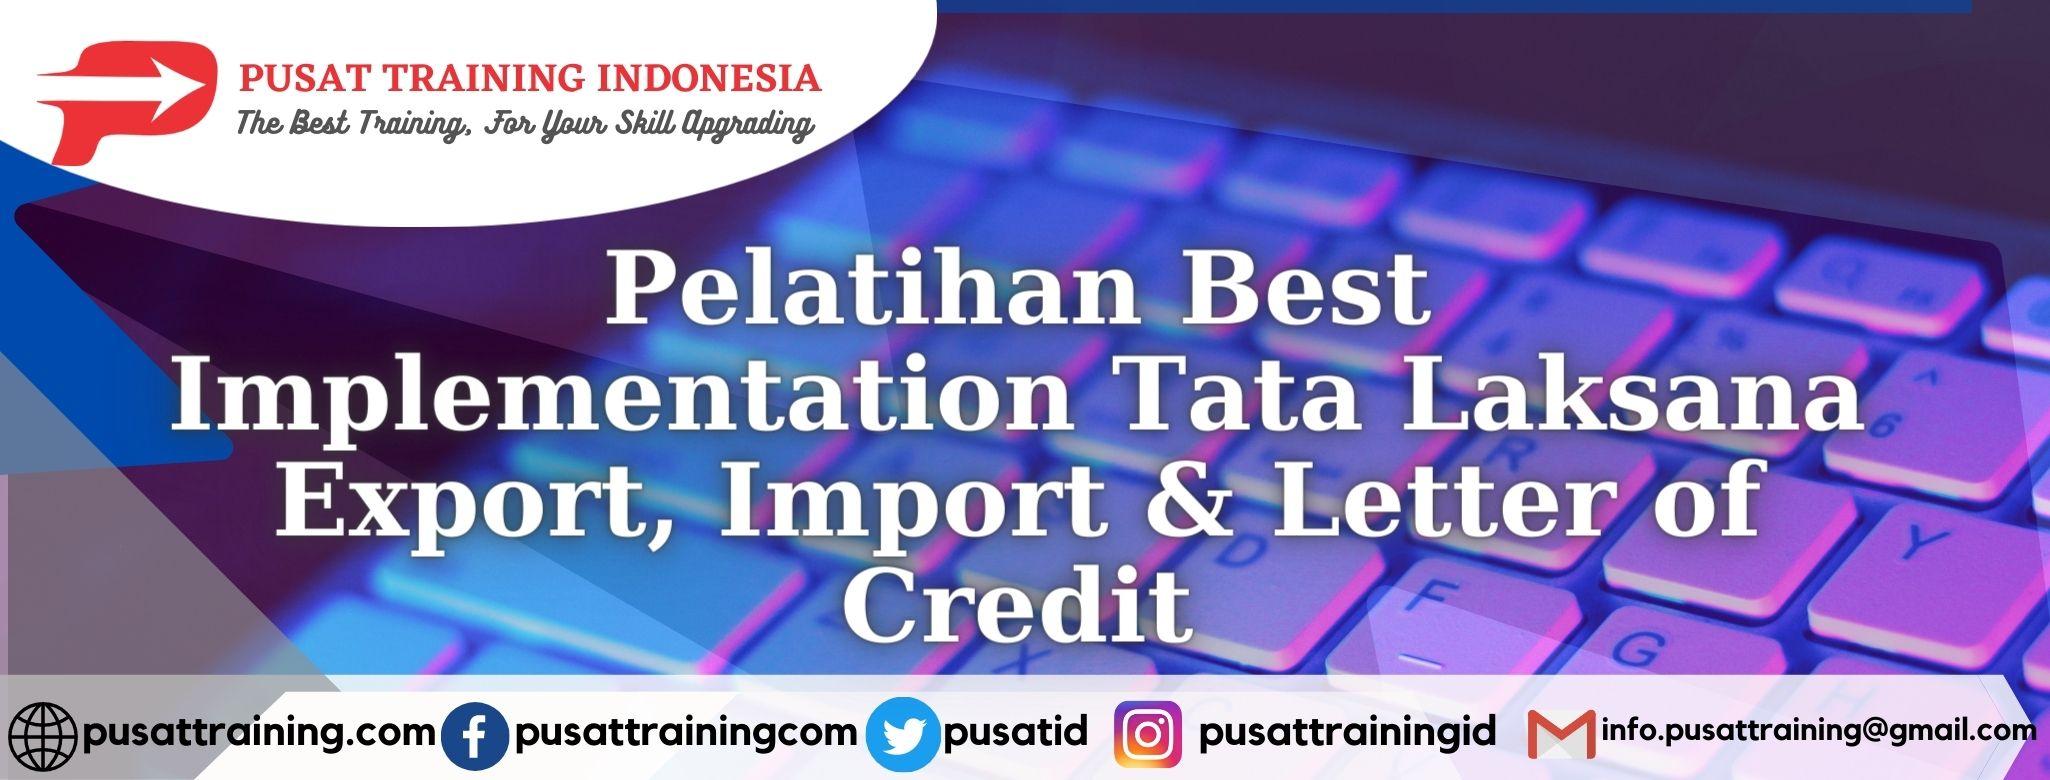 Pelatihan-Best-Implementation-Tata-Laksana-Export-Import-Letter-of-Credit